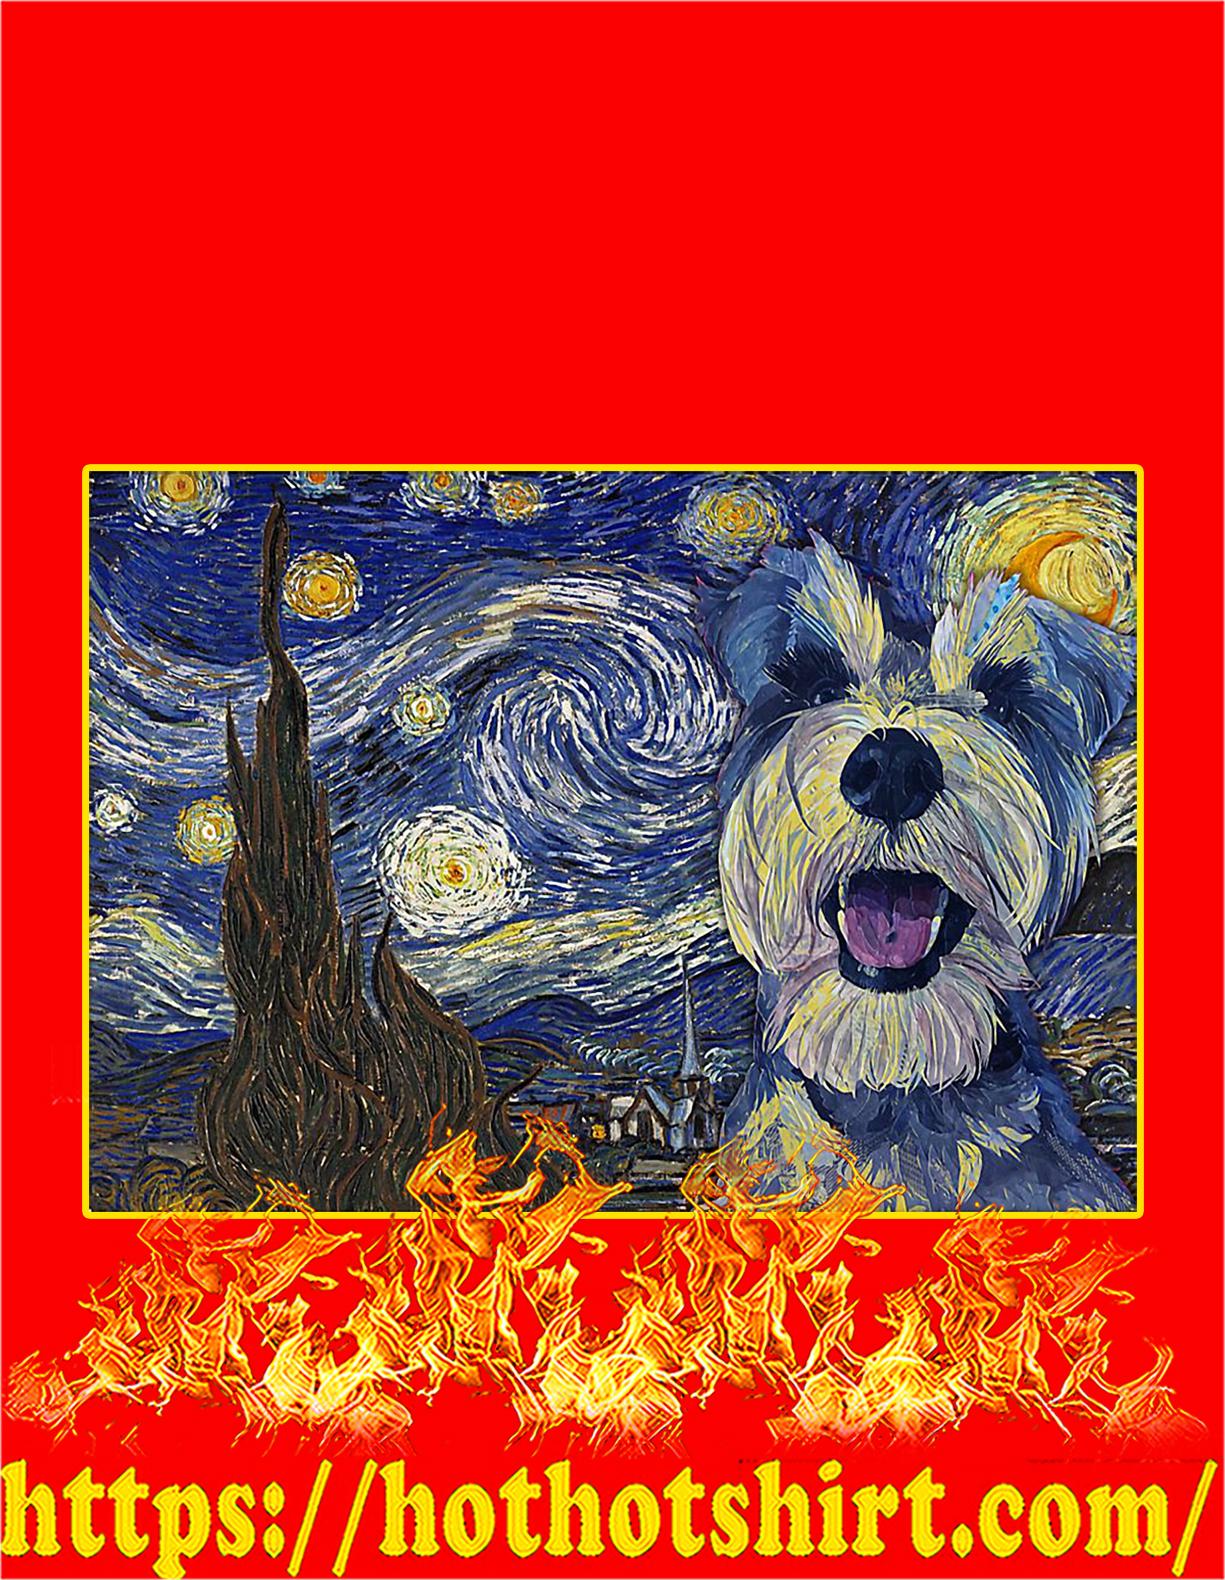 Schnauzer starry night van gogh poster - A3